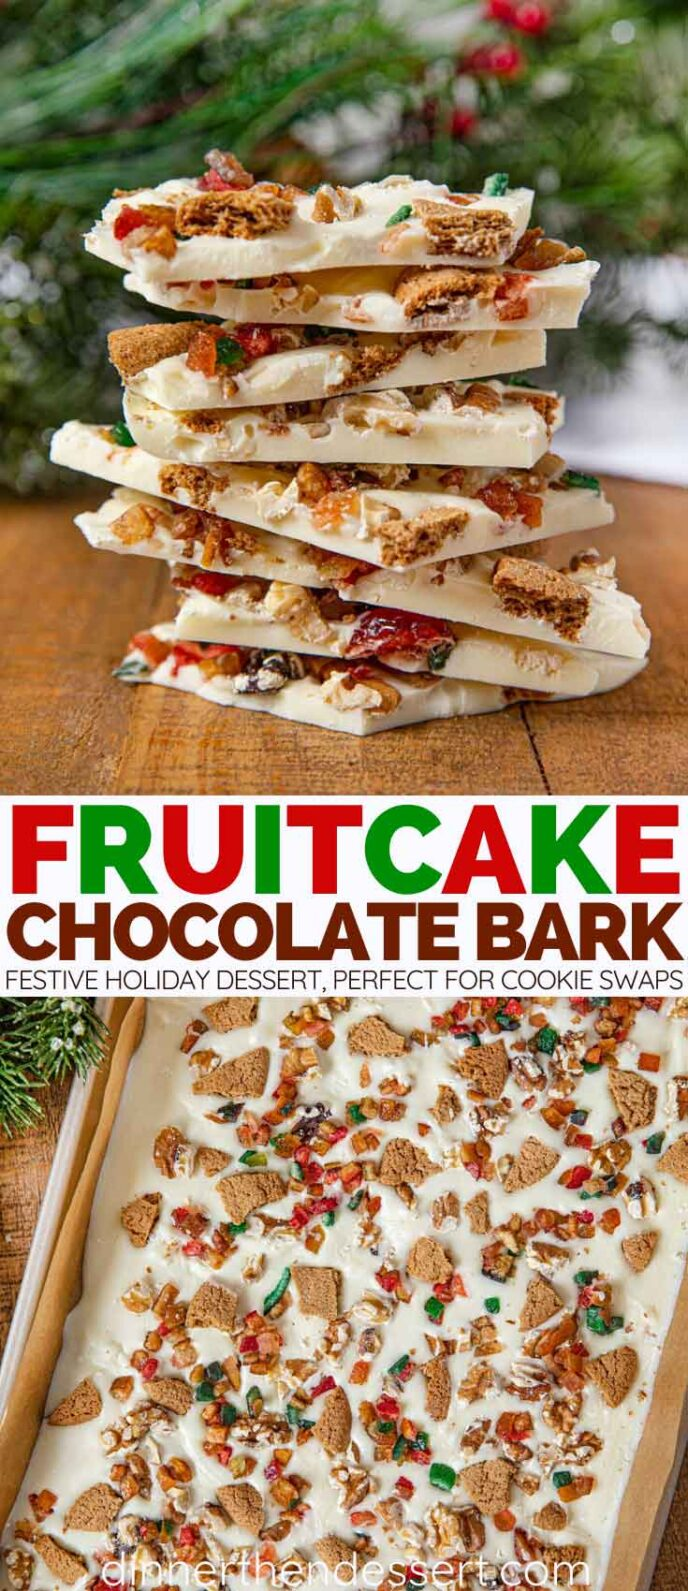 Fruit Cake Chocolate Bark collage